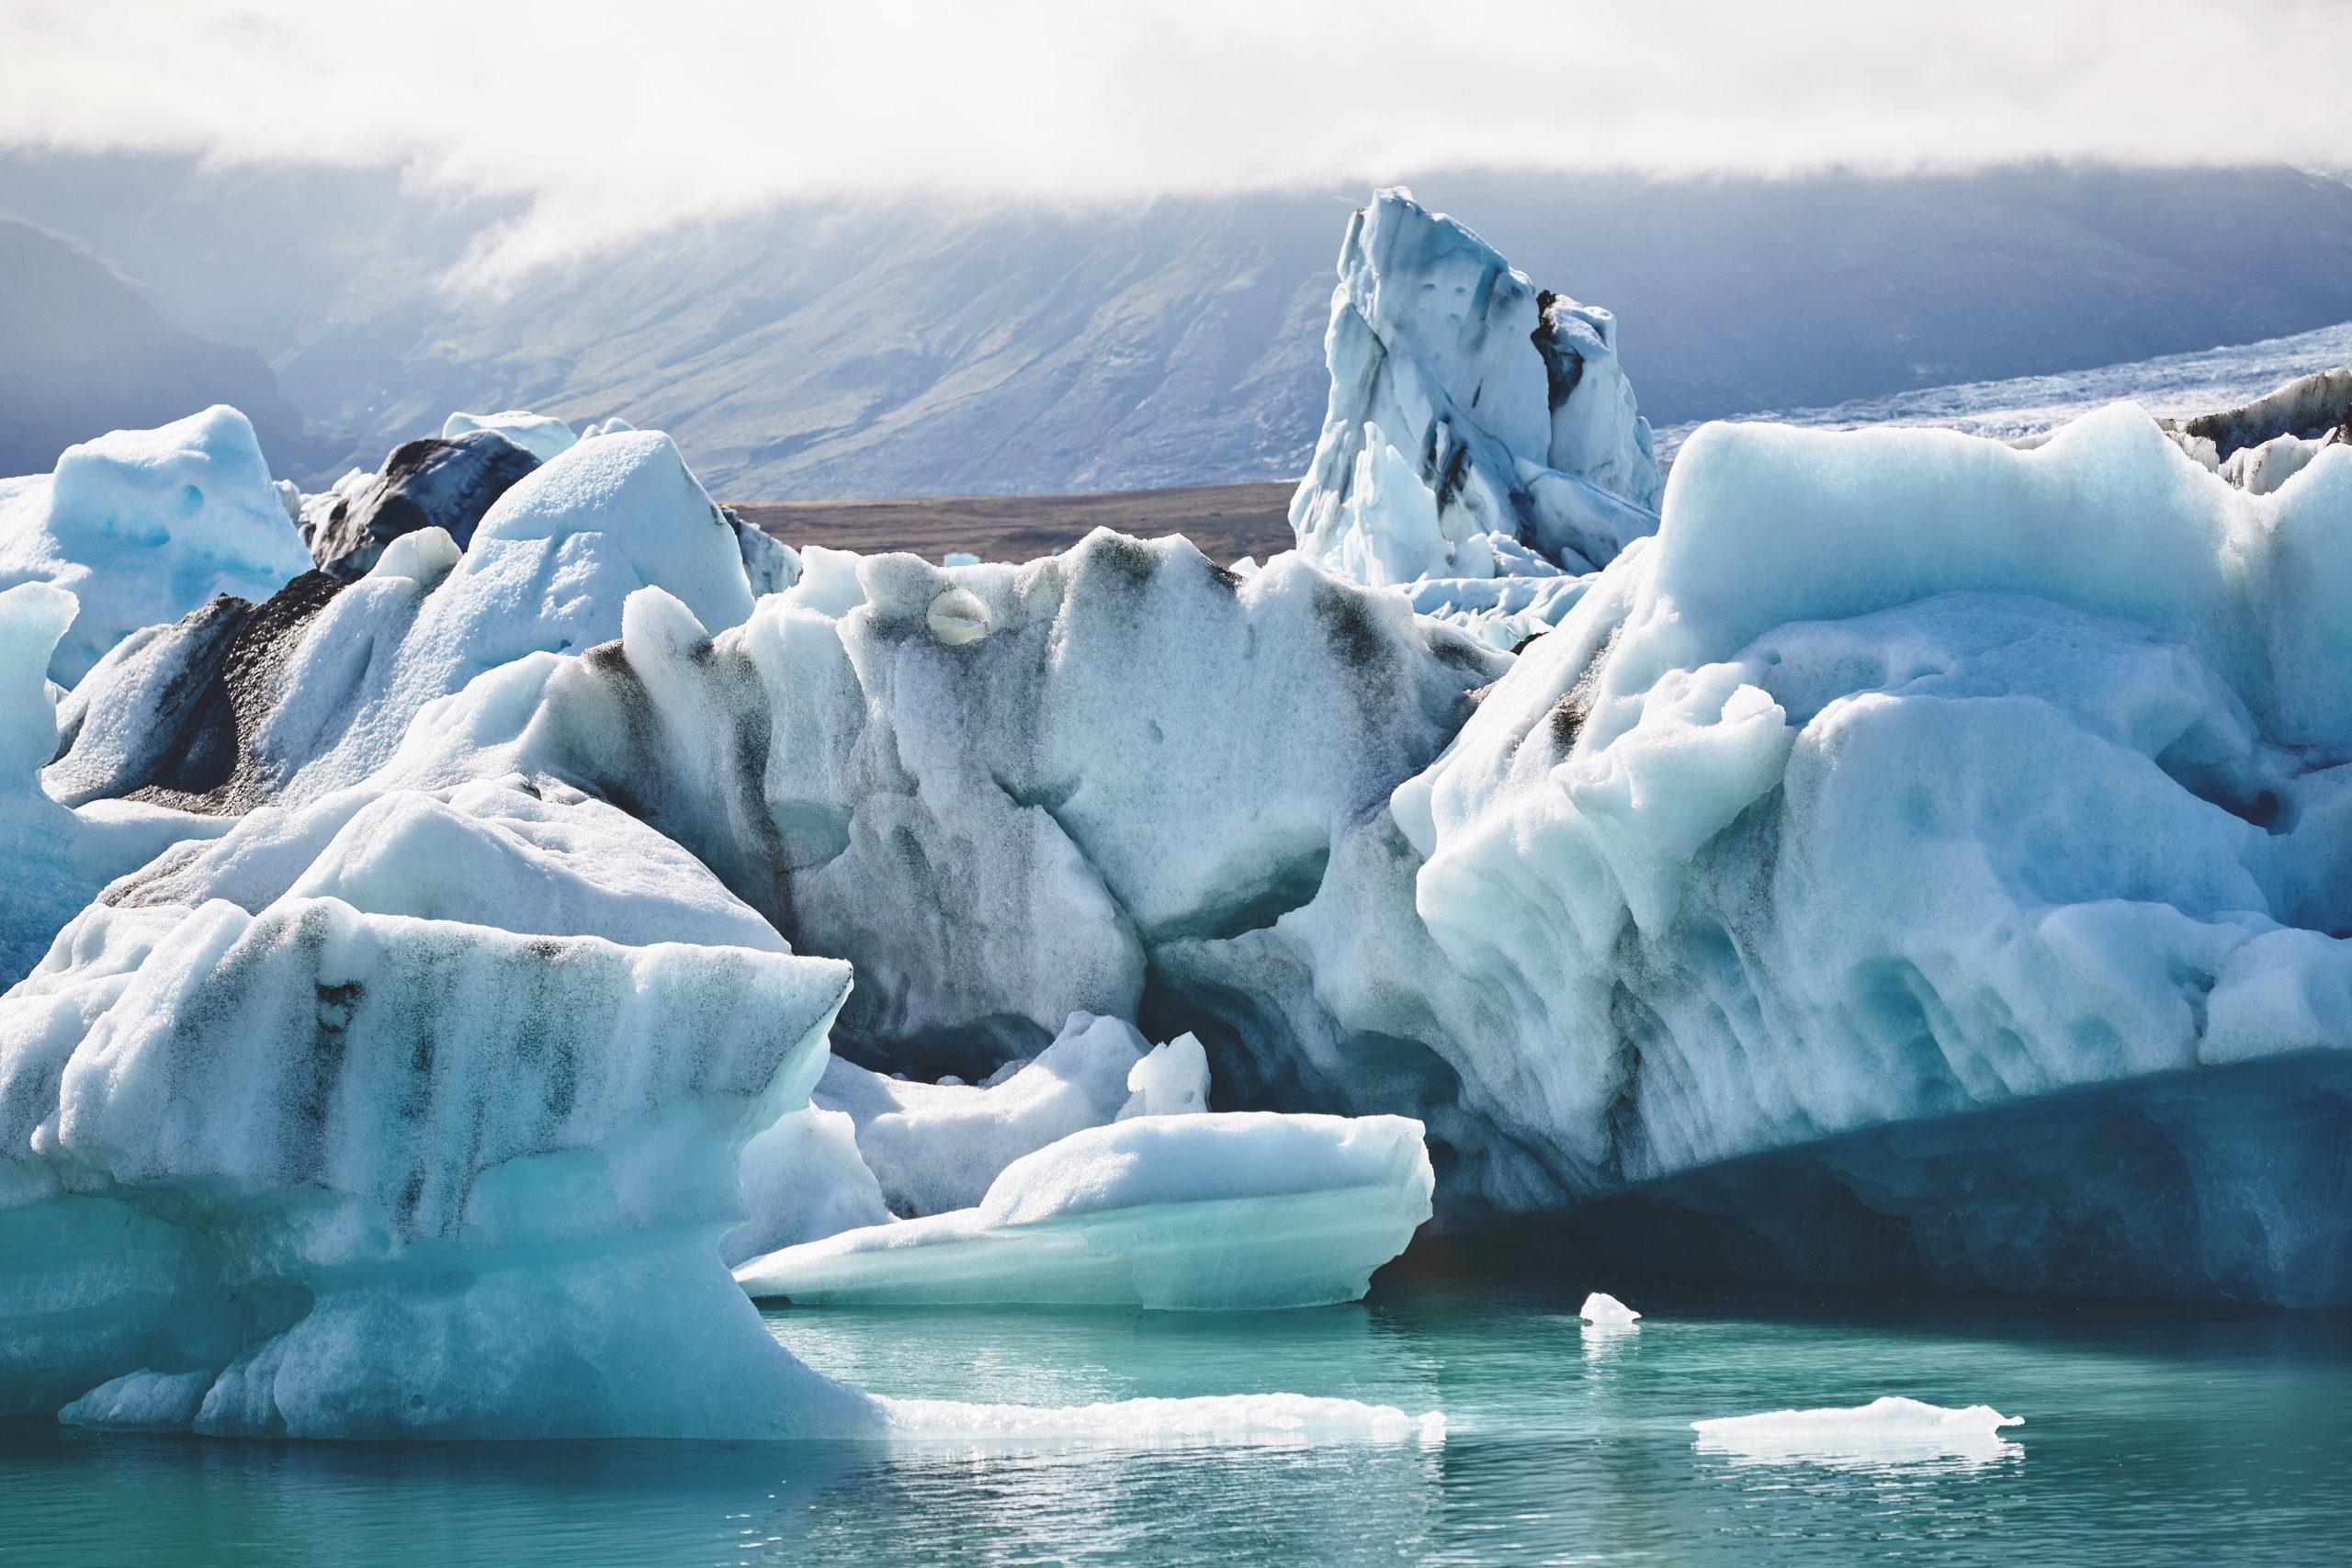 Beautiful vibrant picture of icelandic